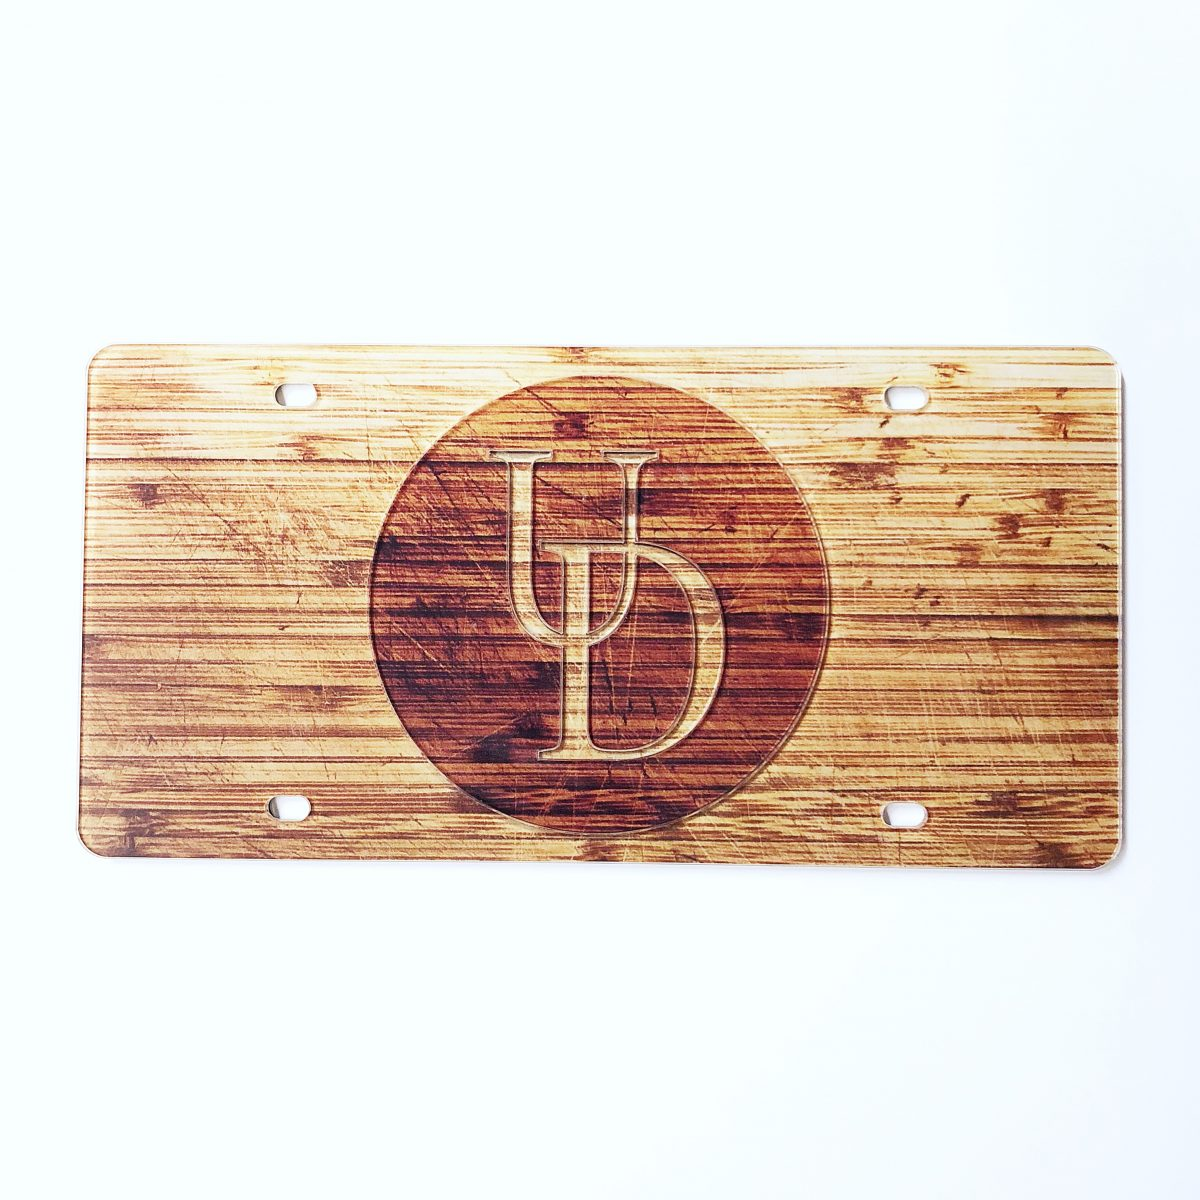 University Of Delaware Wood Grain License Plate National